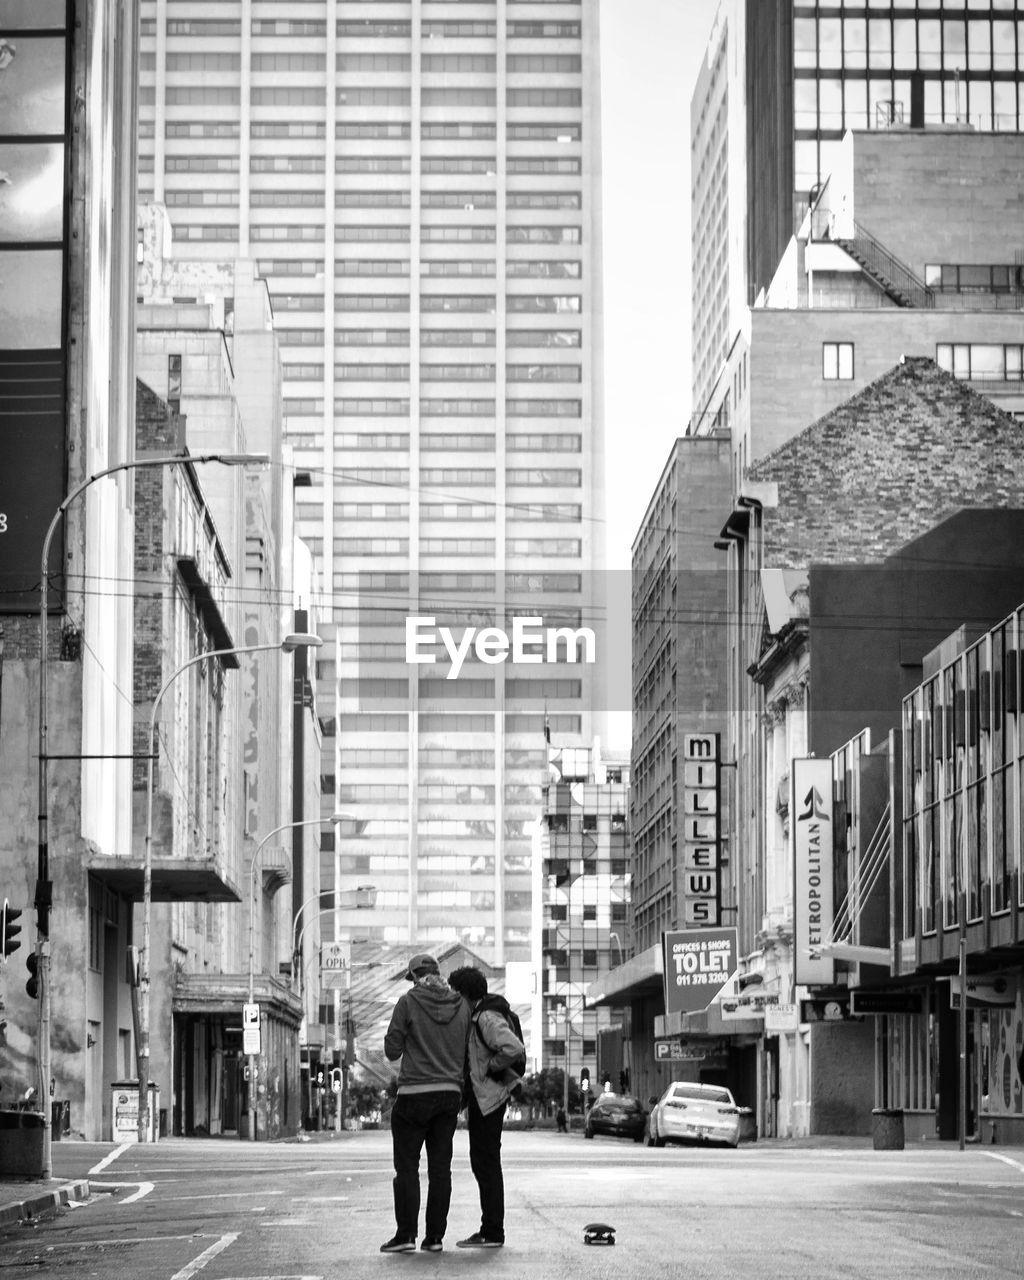 Friends Standing On Street In City